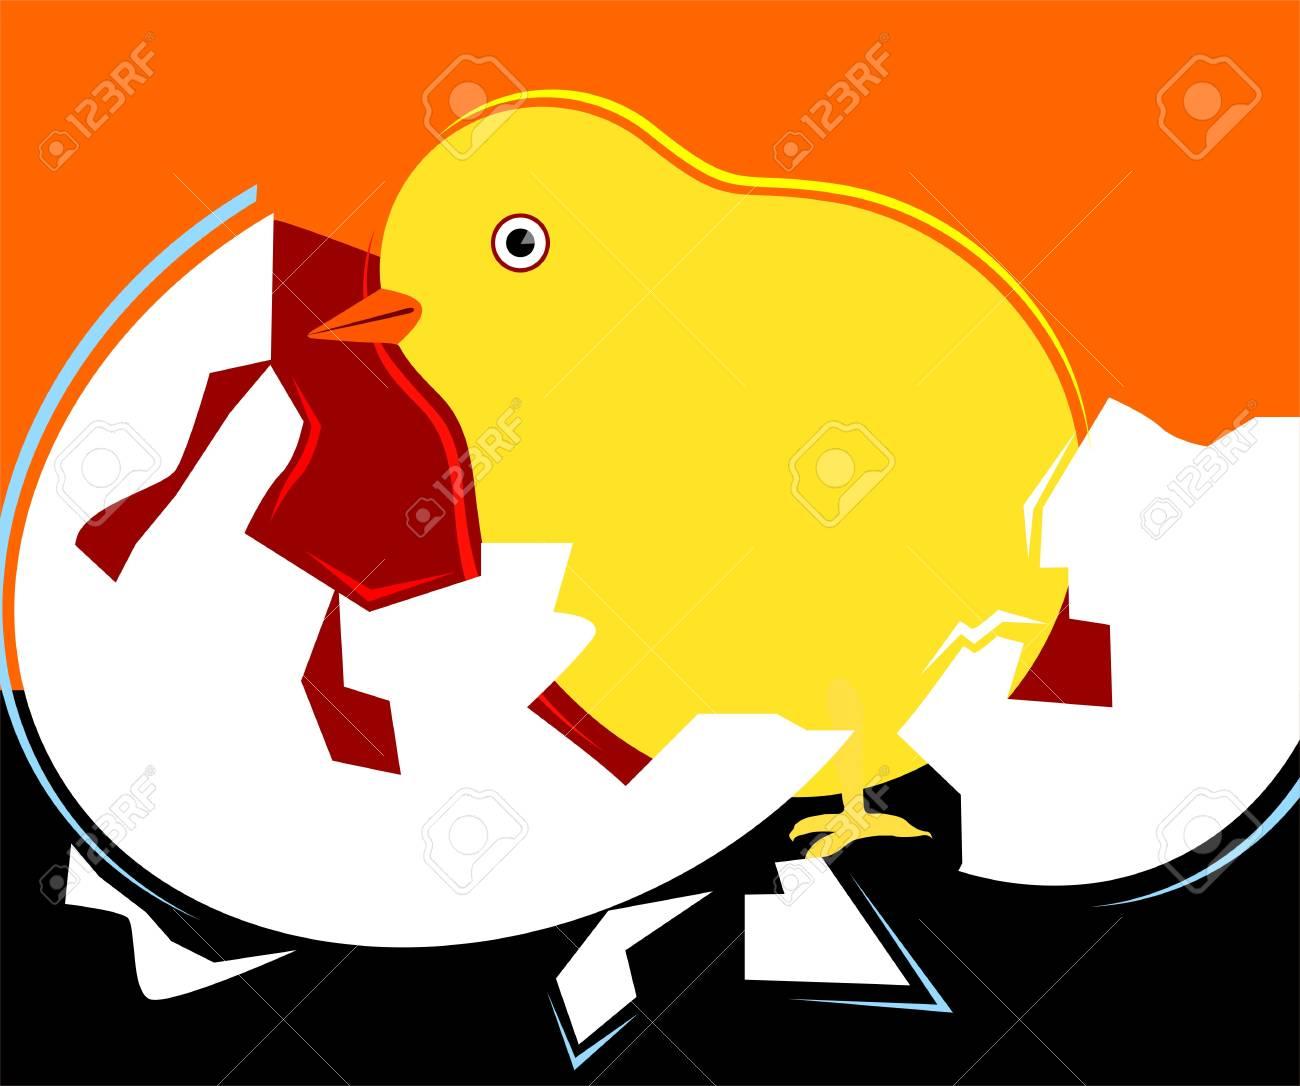 Illustration of chicken being born Stock Photo - 4088085